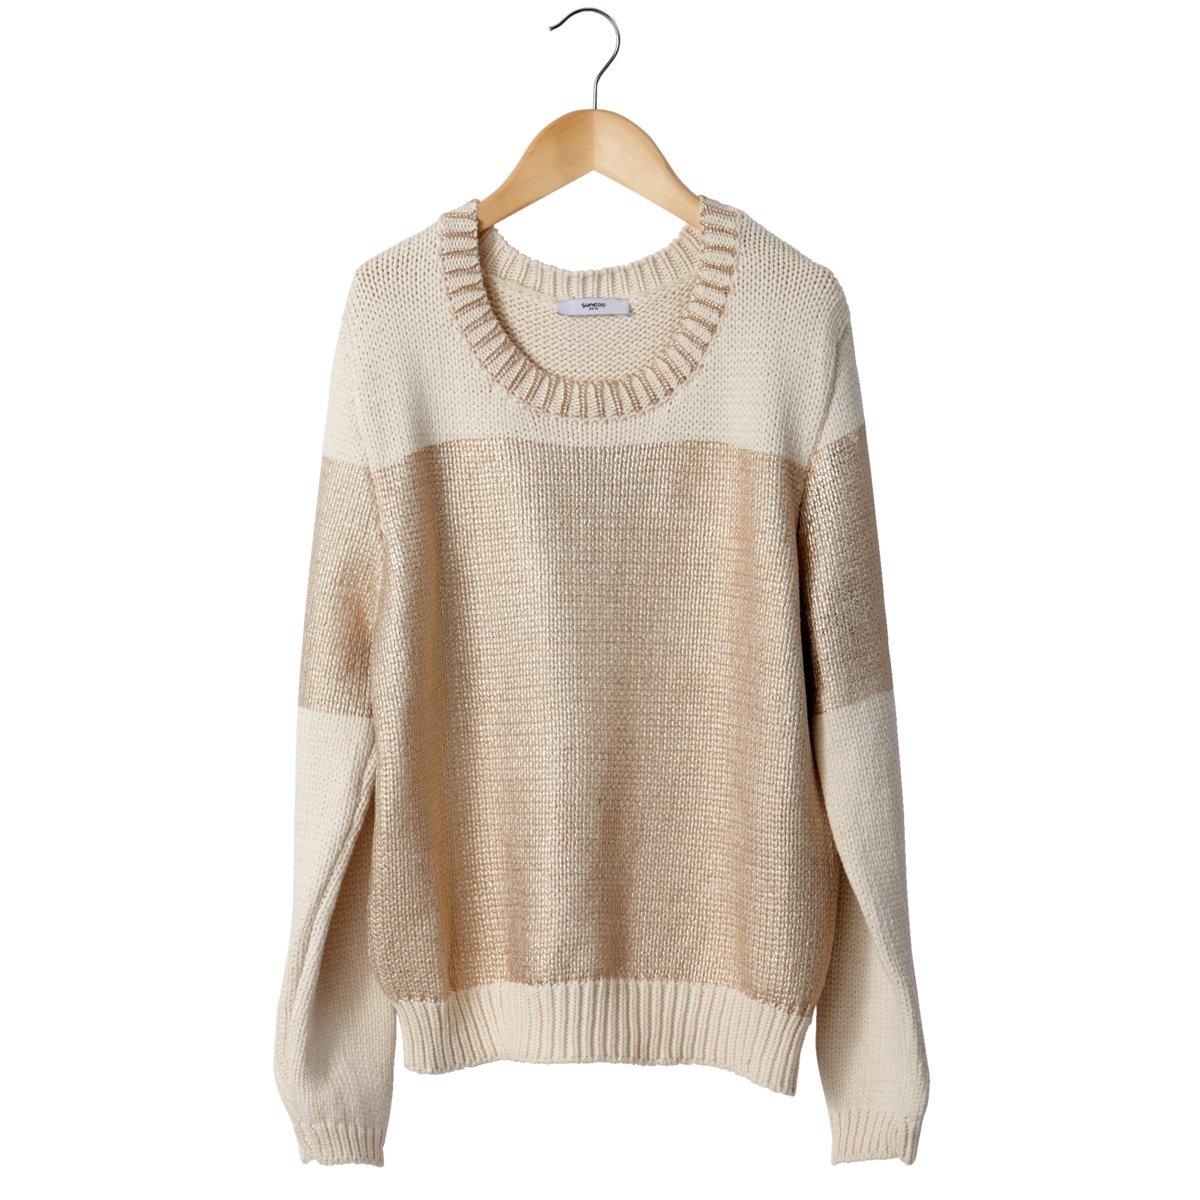 Пуловер<br><br>Цвет: бежевый<br>Размер: 1(S).2(M)